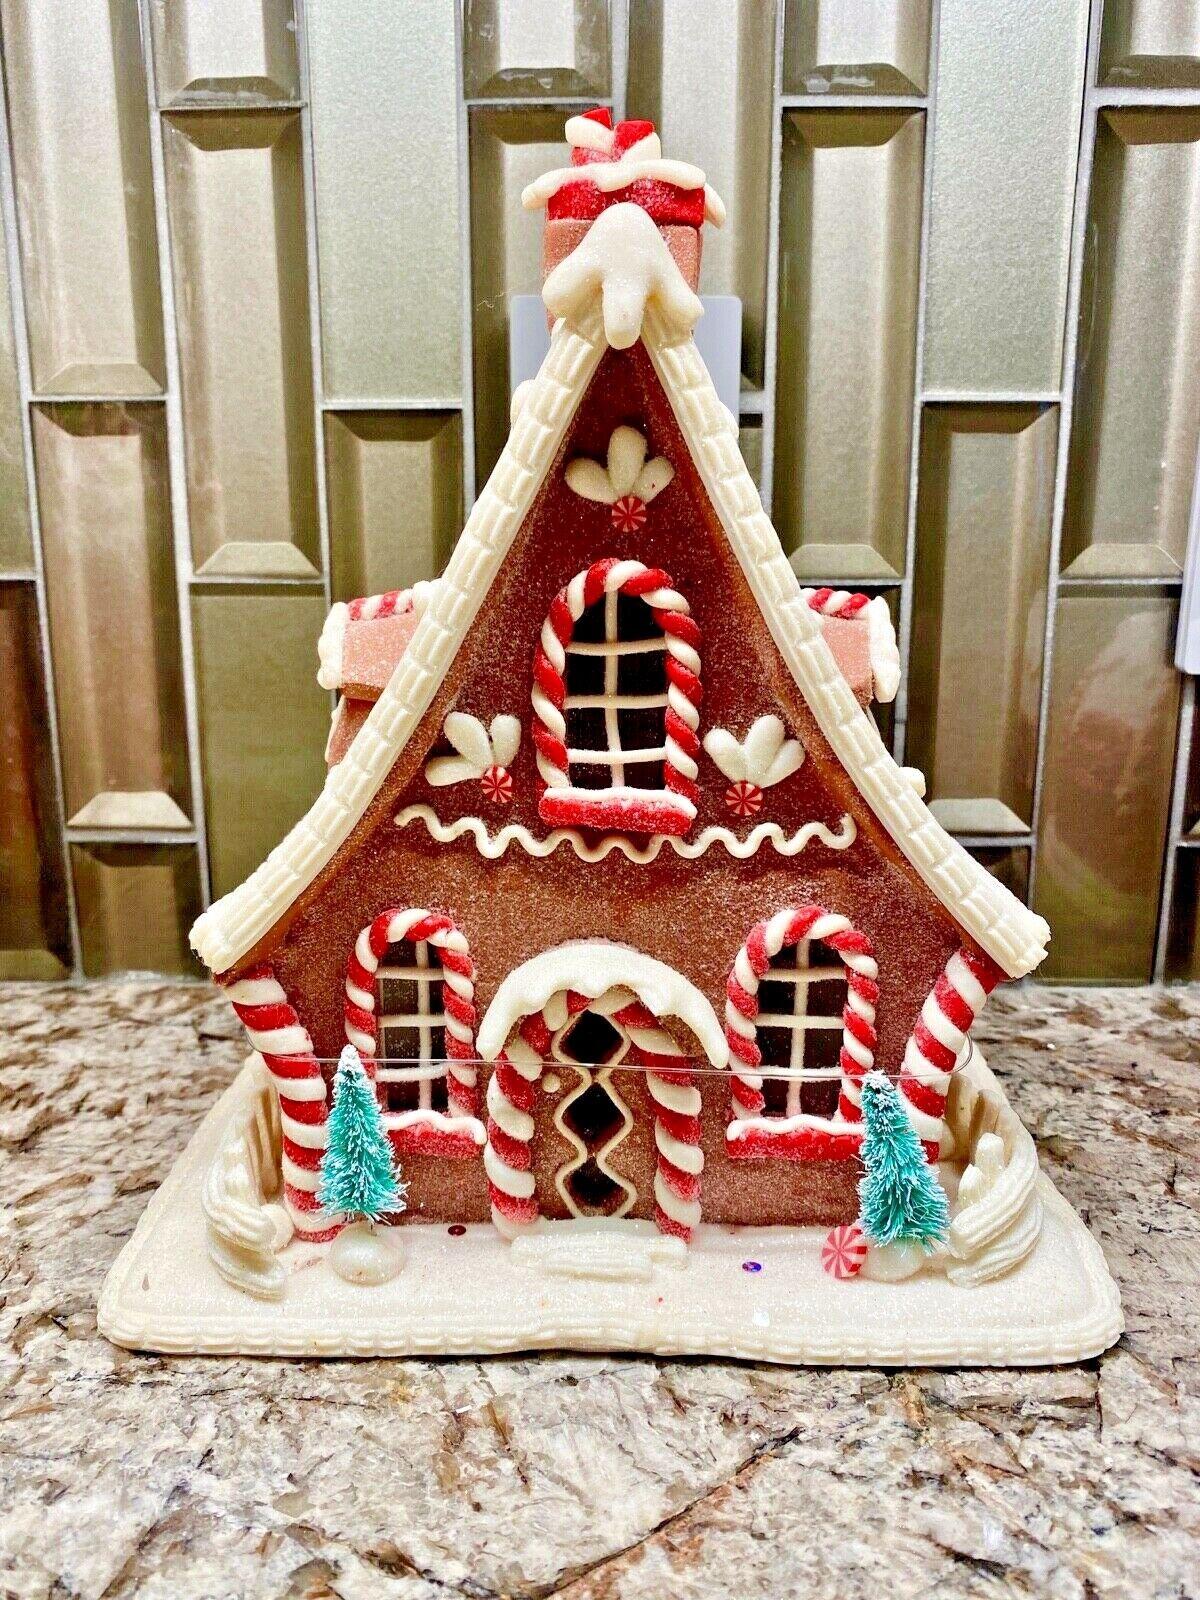 Raz 7 25 Led Lighted Claydough Gingerbread House Christmas Figure